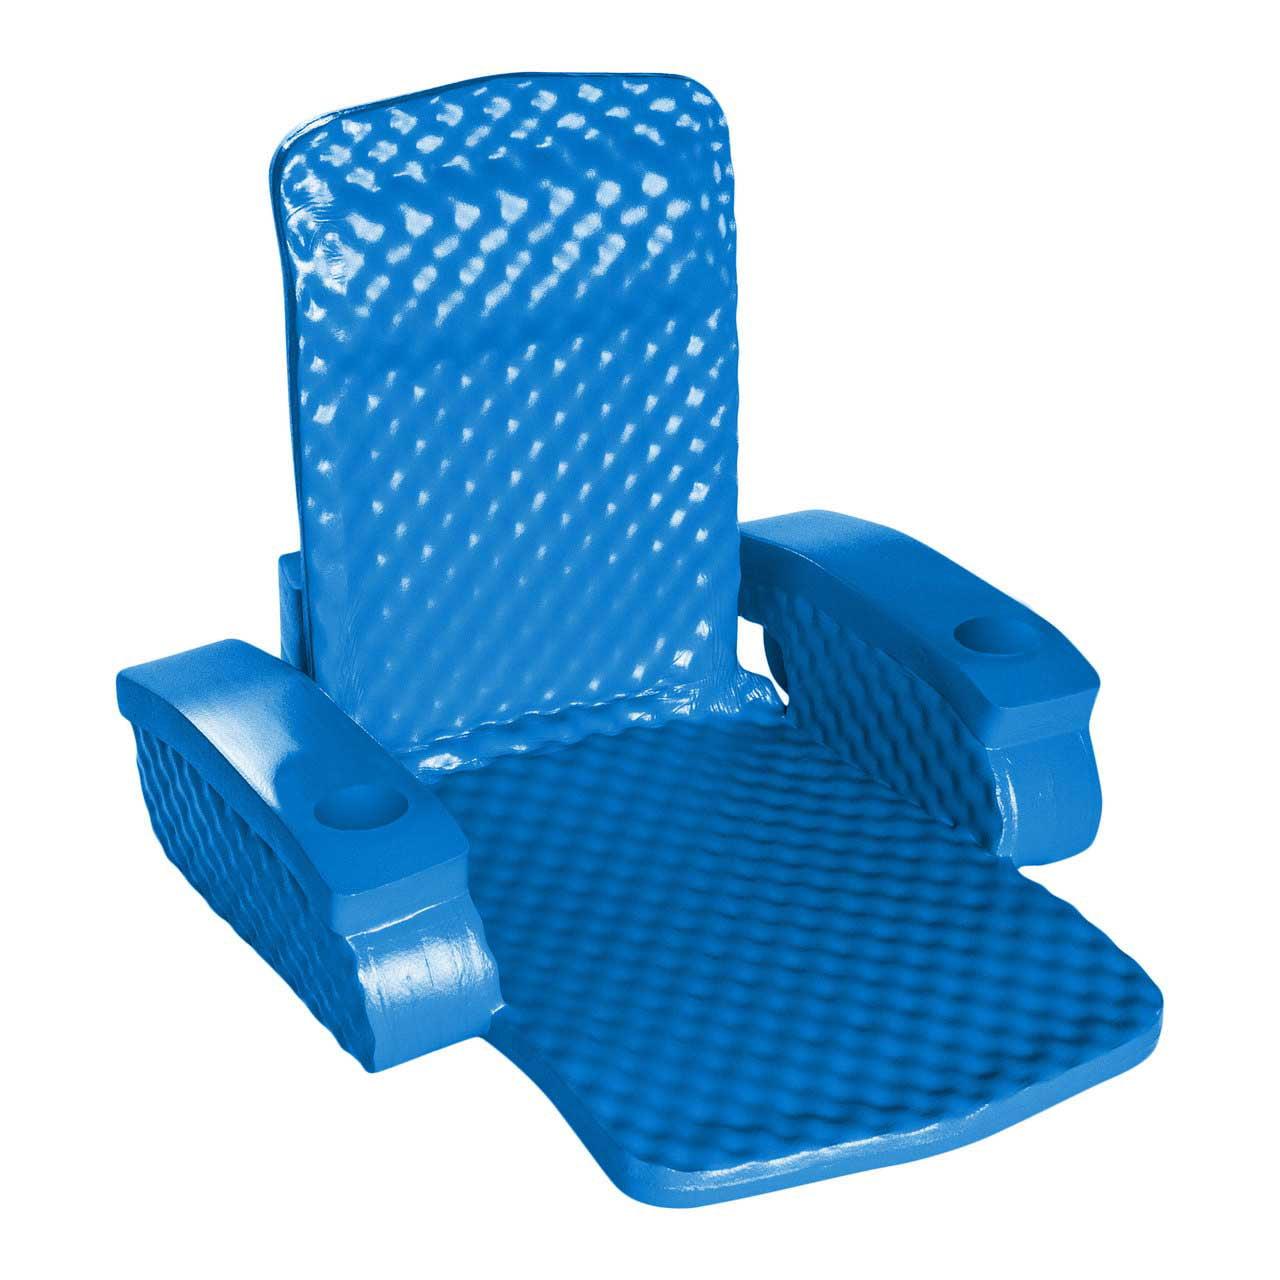 TRC Recreation Super Soft Baja Swimming Pool Folding Chair Foam Lounge Float